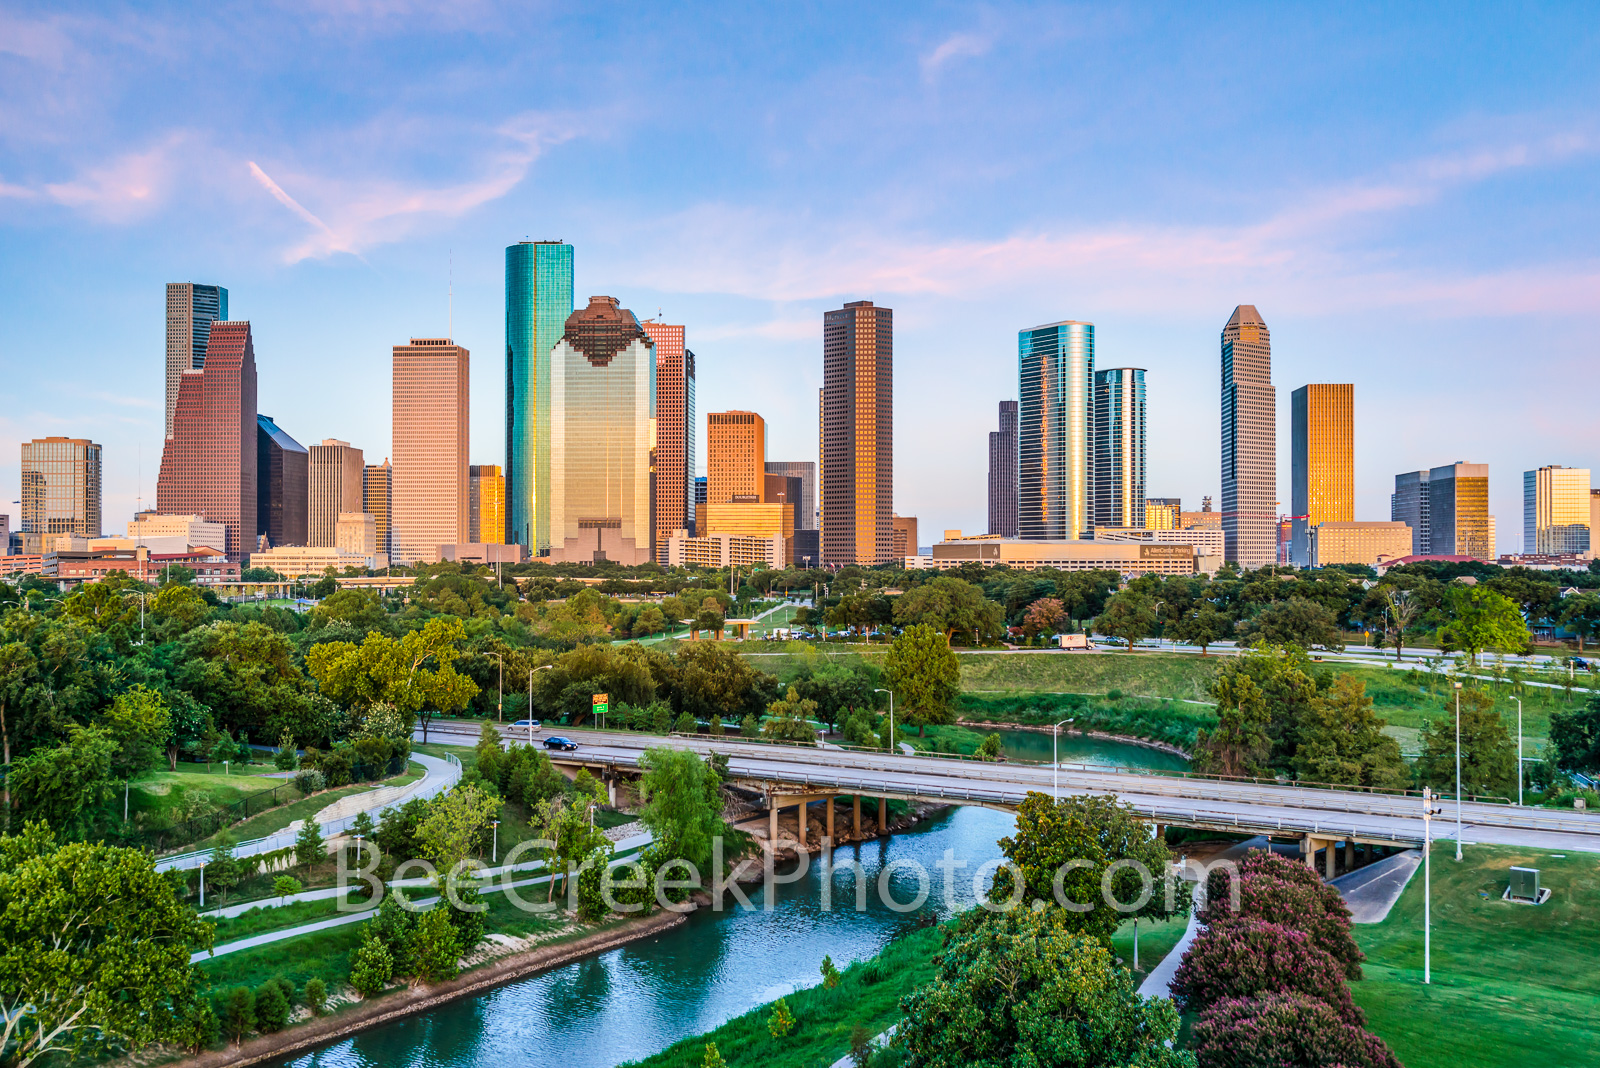 Houston Skyline at Dusk - This is an aerial view of the Houston skyline from a city park that runs along the Buffalo Bayou near...